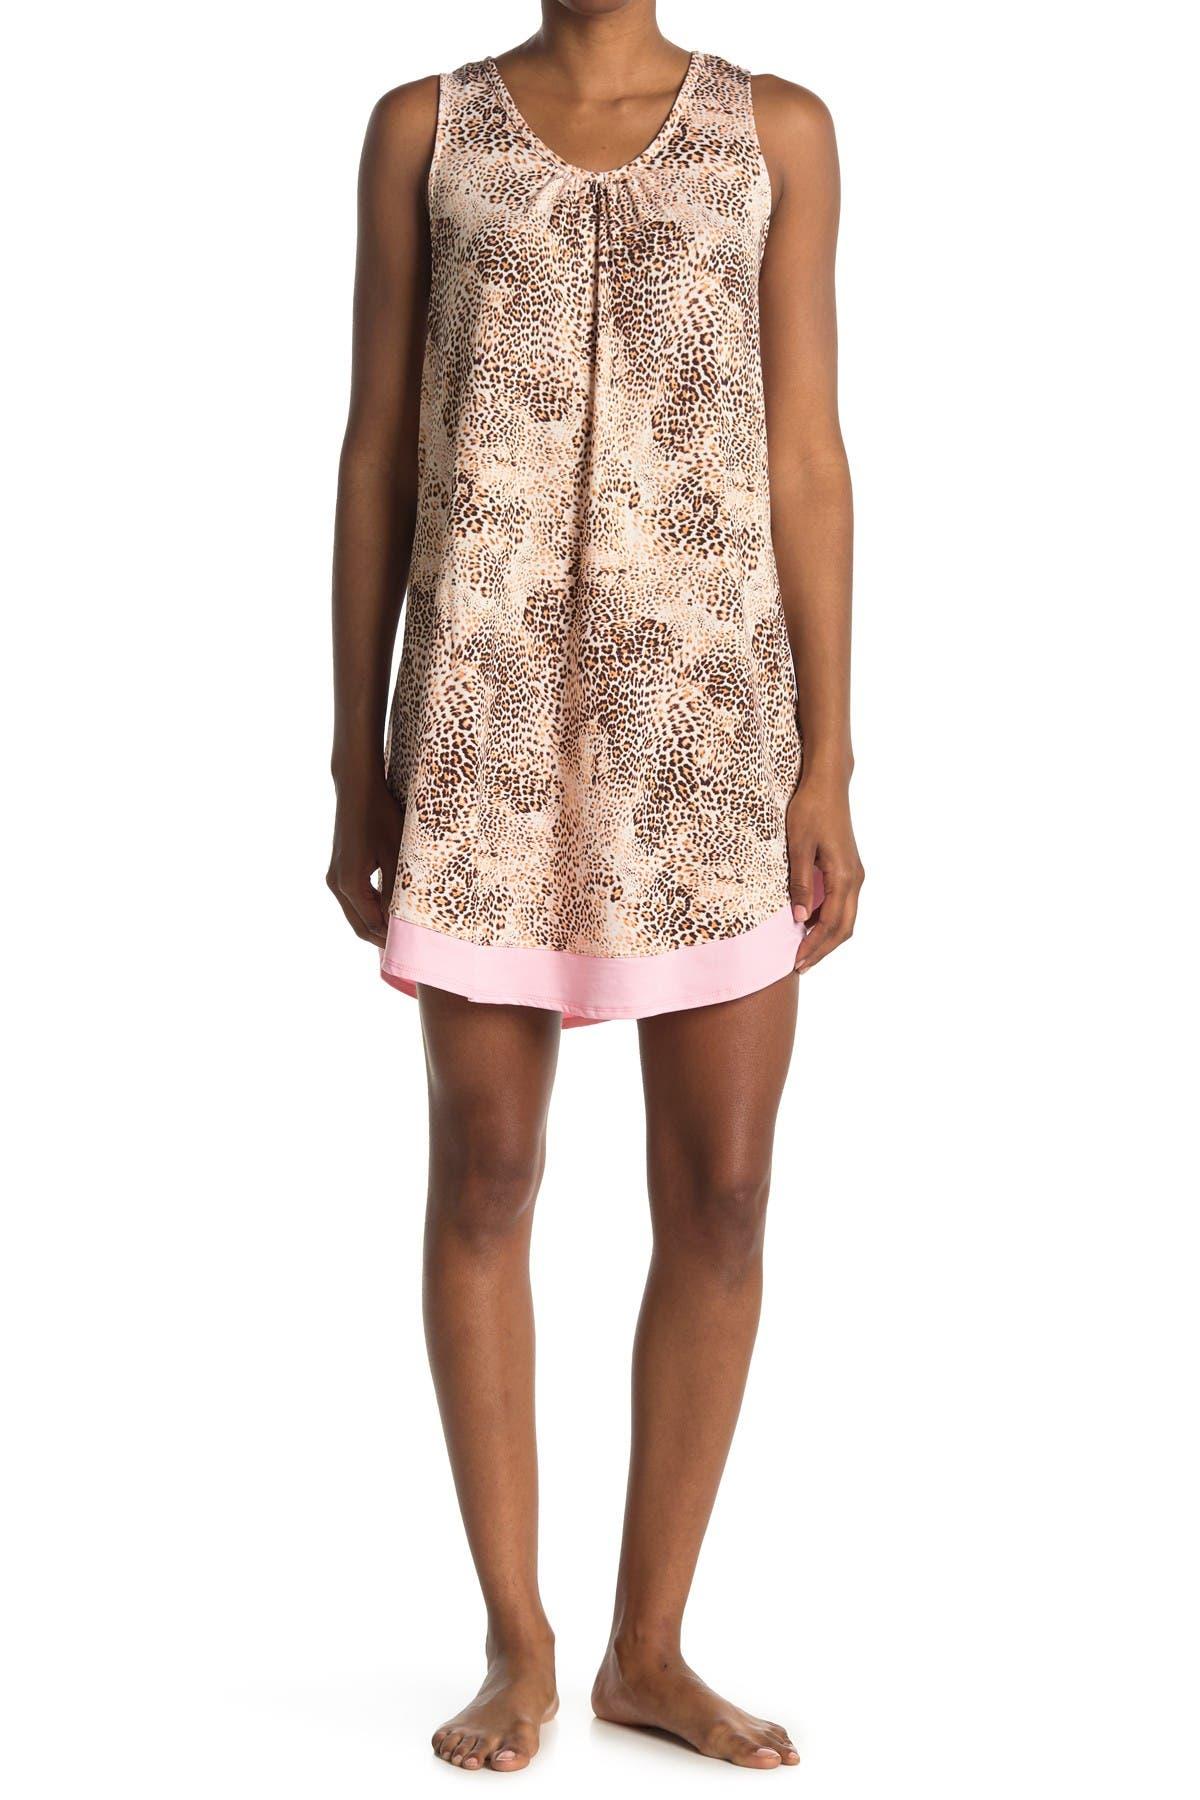 Image of Ellen Tracy Sleeveless Nightgown